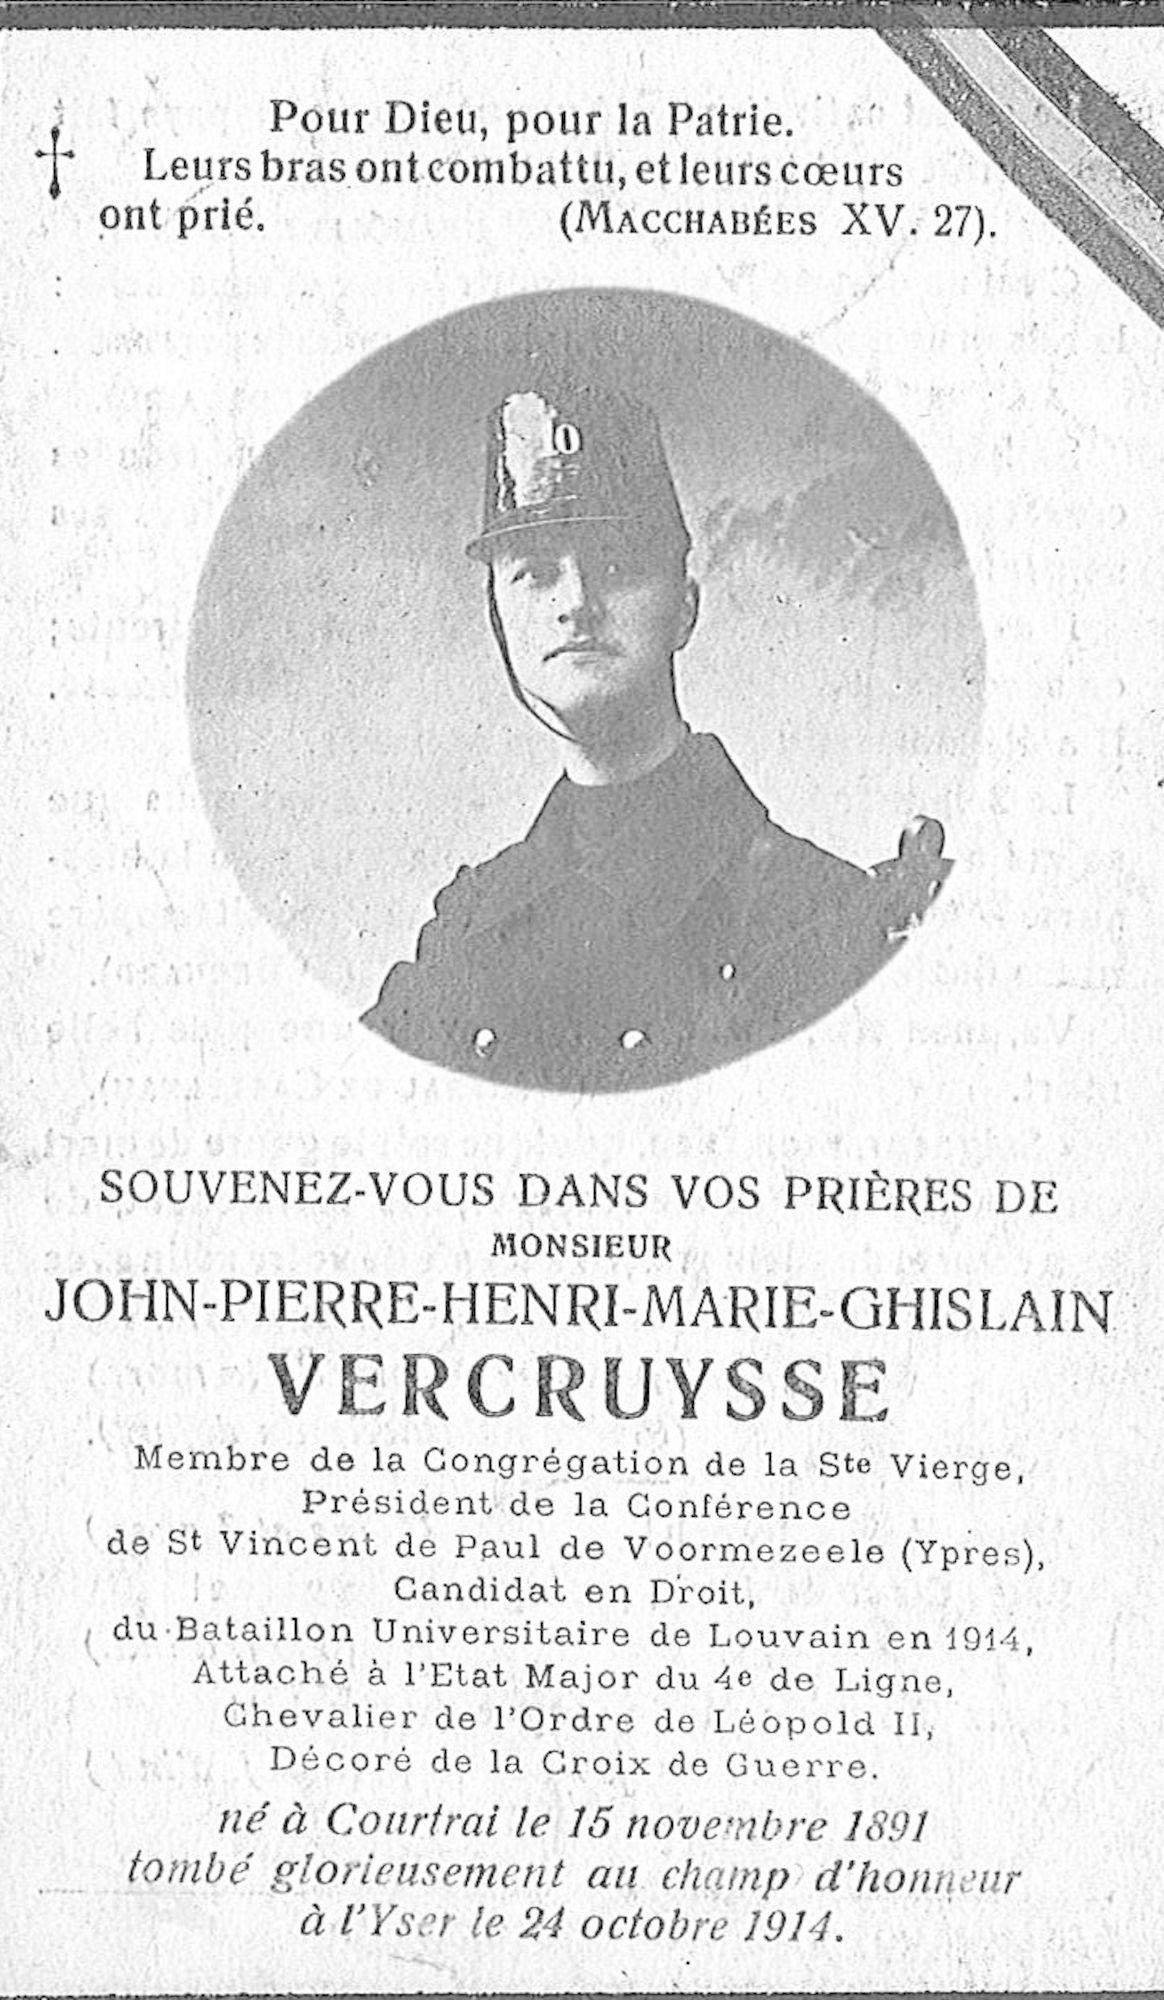 John-Pierre-Henri-Marie-Ghislain Vercruysse